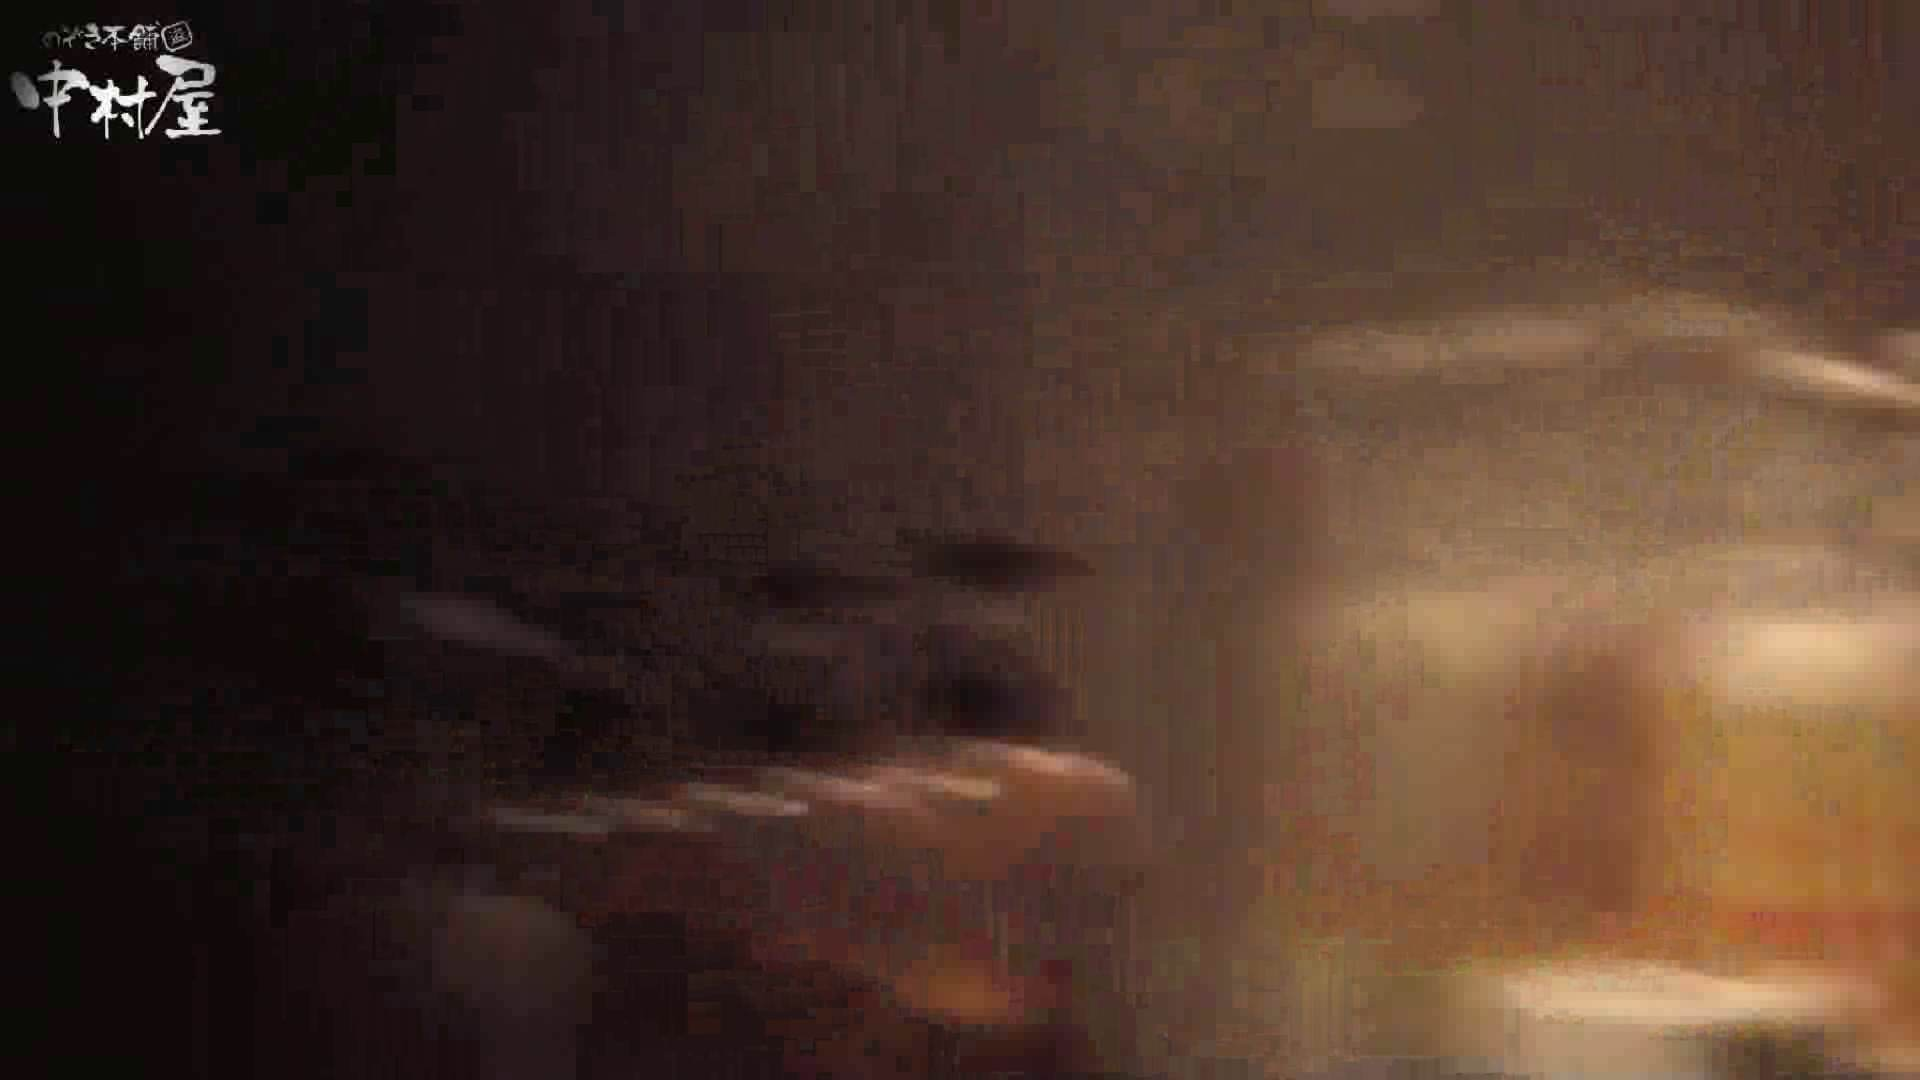 民家風呂専門盗撮師の超危険映像 vol.009 民家エロ投稿 セックス無修正動画無料 104画像 88